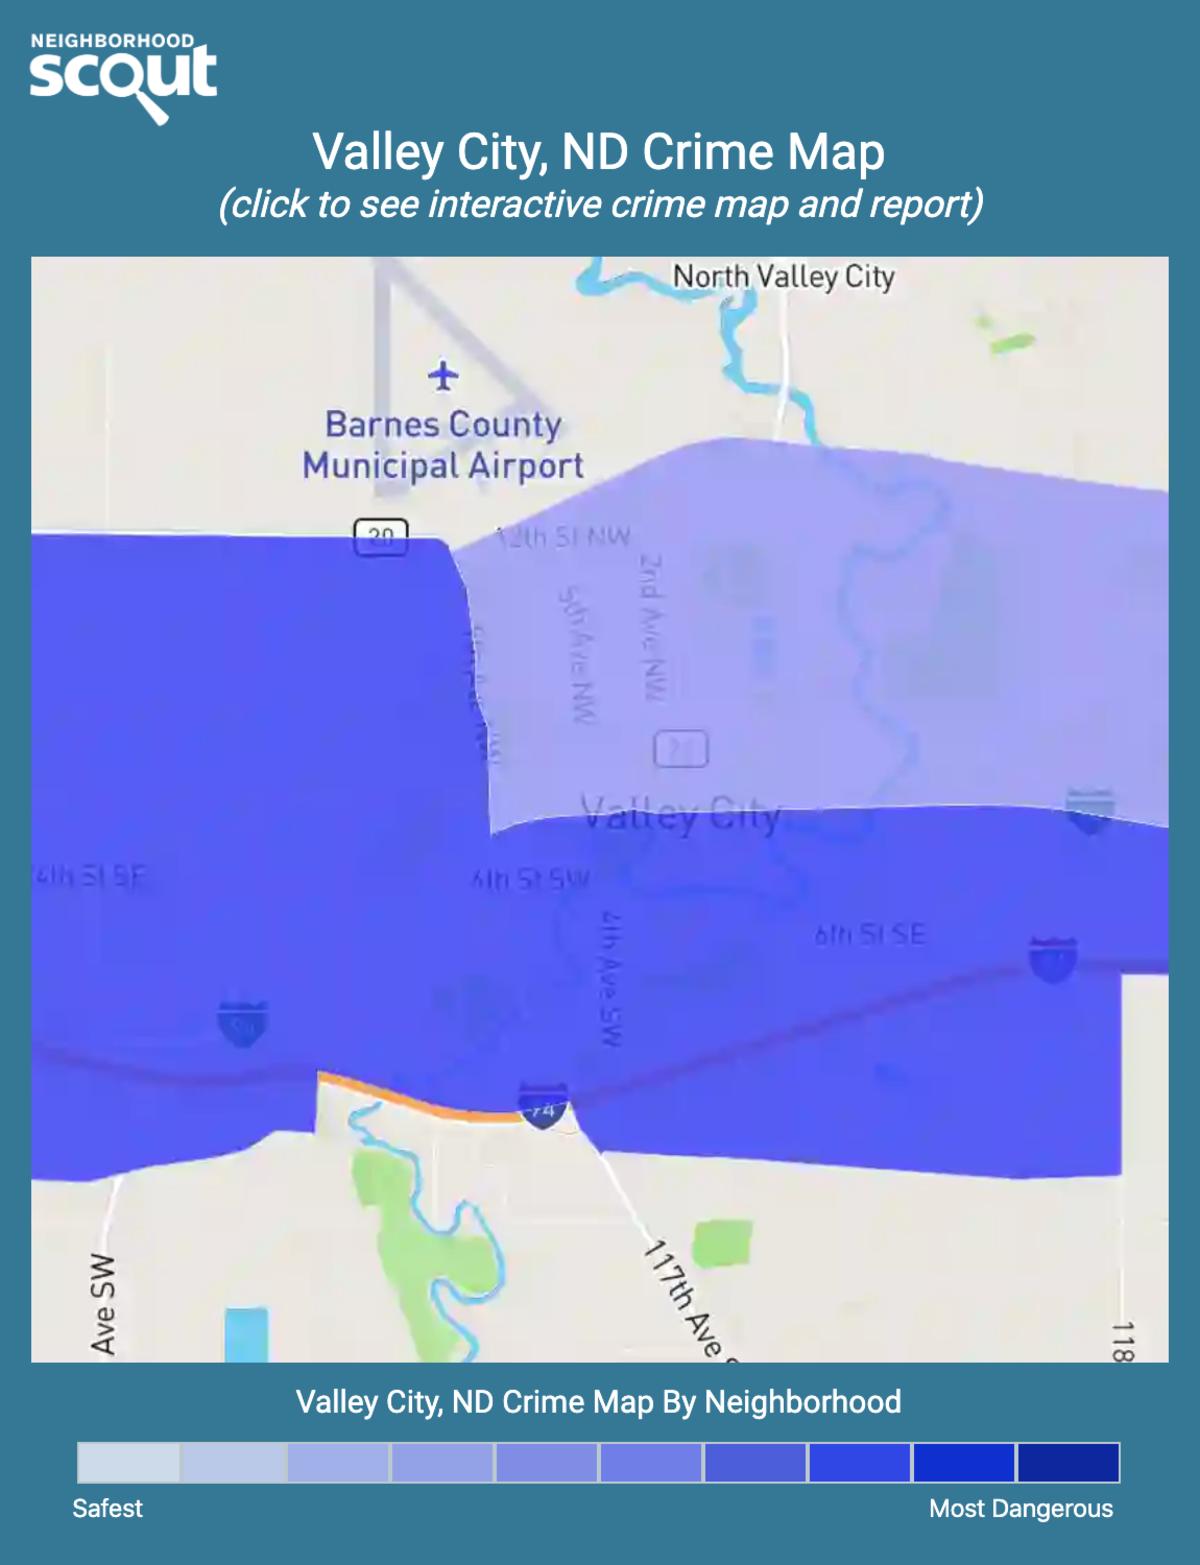 Valley City, North Dakota crime map